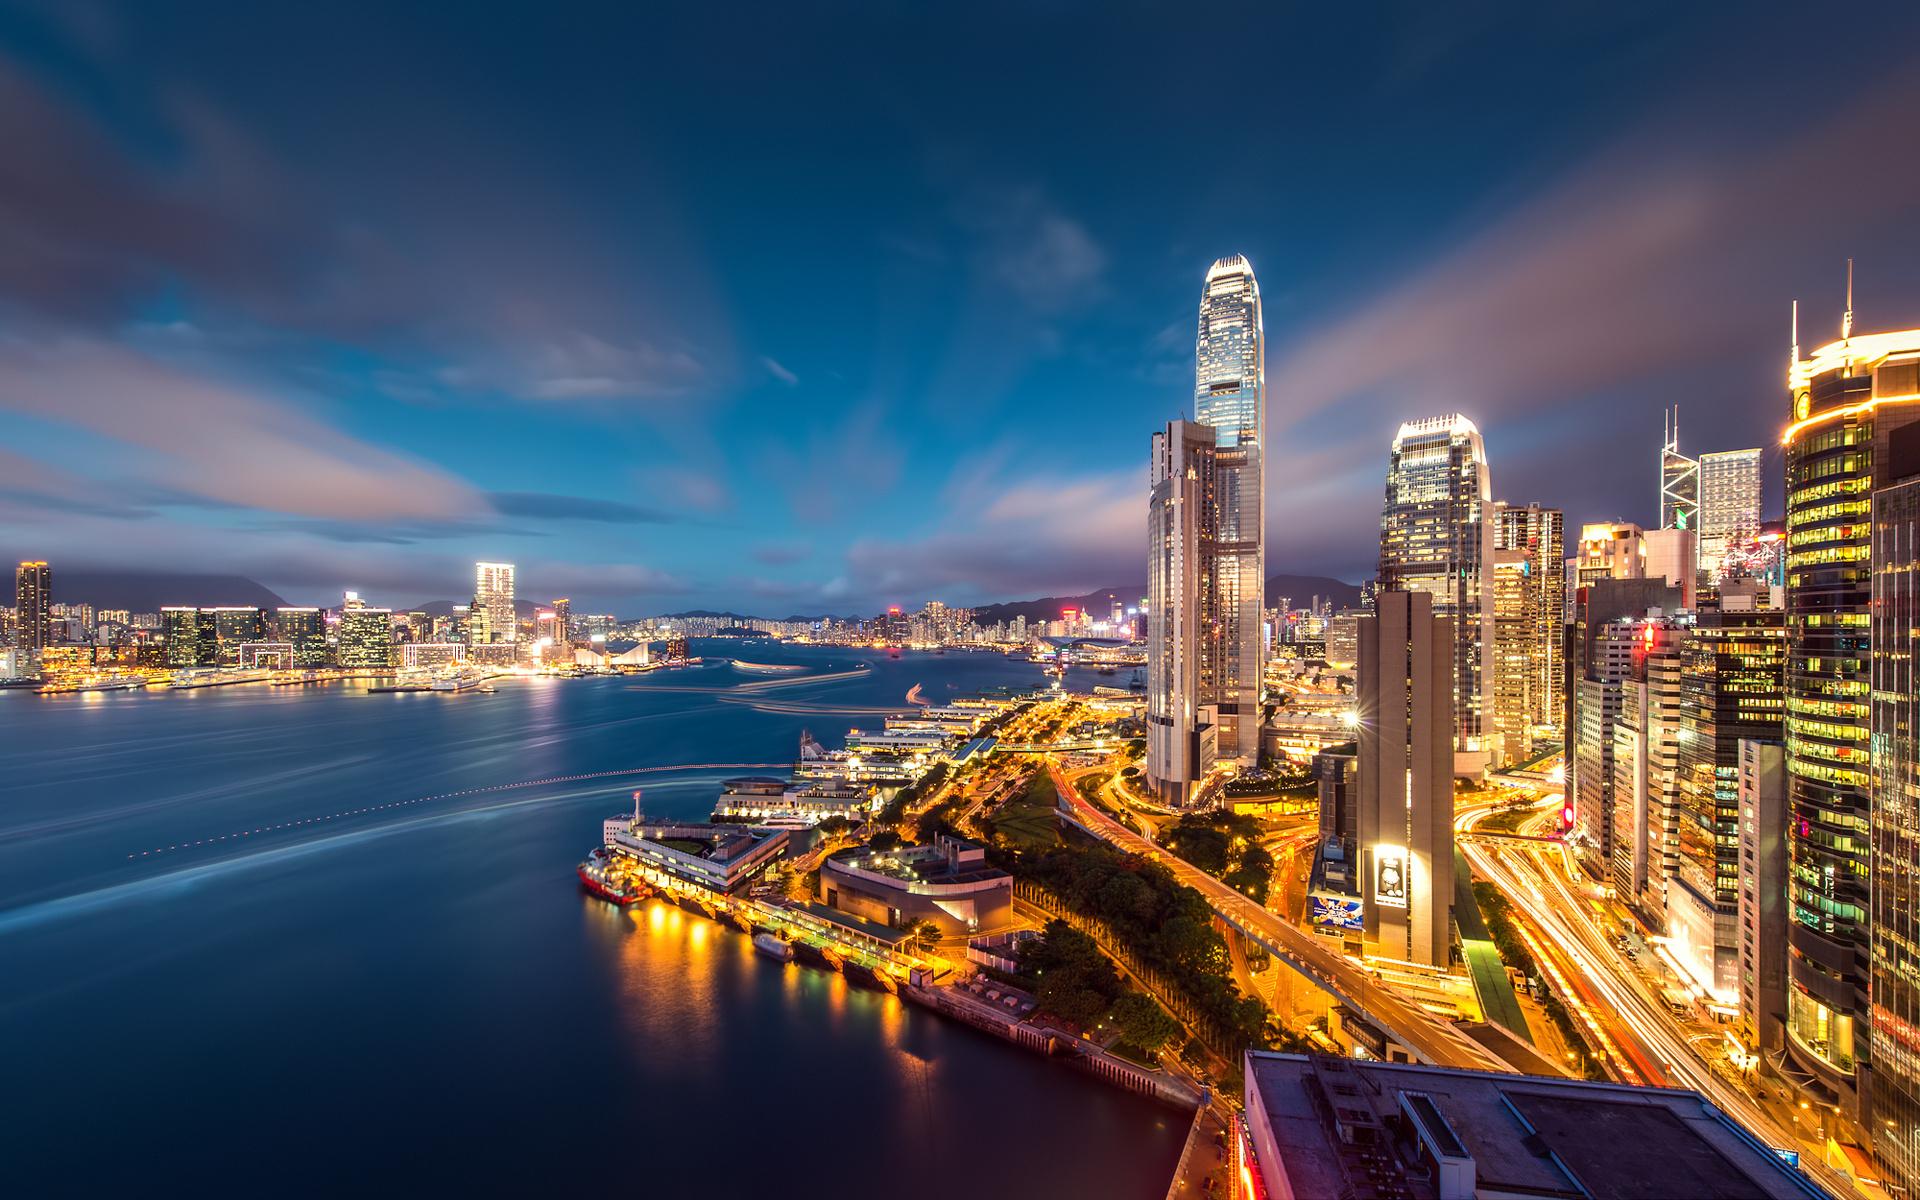 Fond d'ecran Skycrappers Hong Kong de nuit - Wallpaper